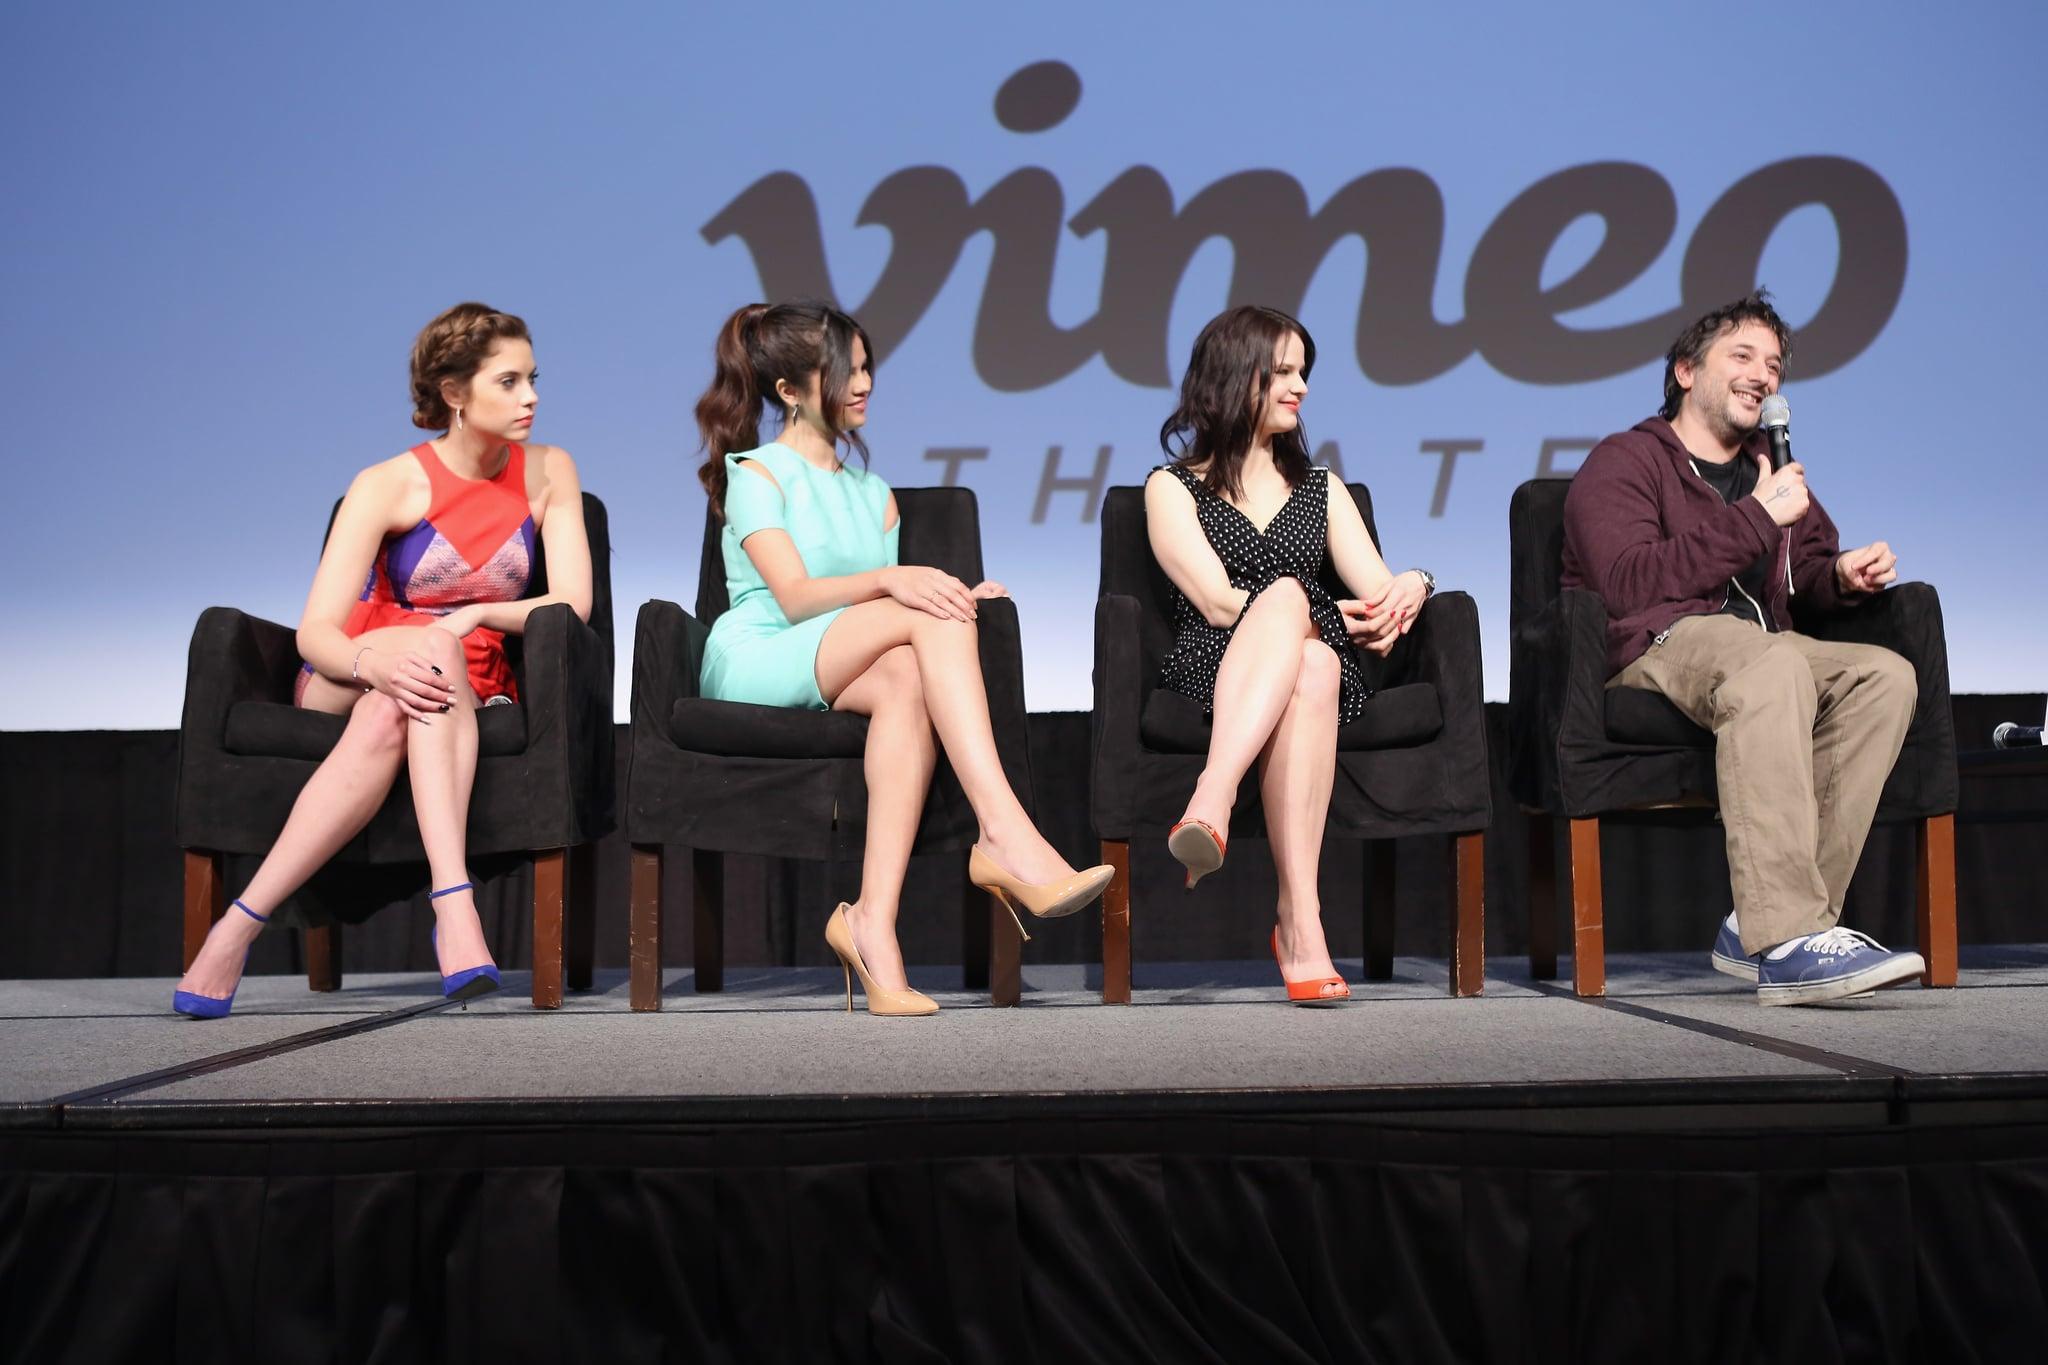 Ashley Benson, Selena Gomez, Rachel Korine, and Harmony Korine attended the Spring Breakers press conference at SXSW.